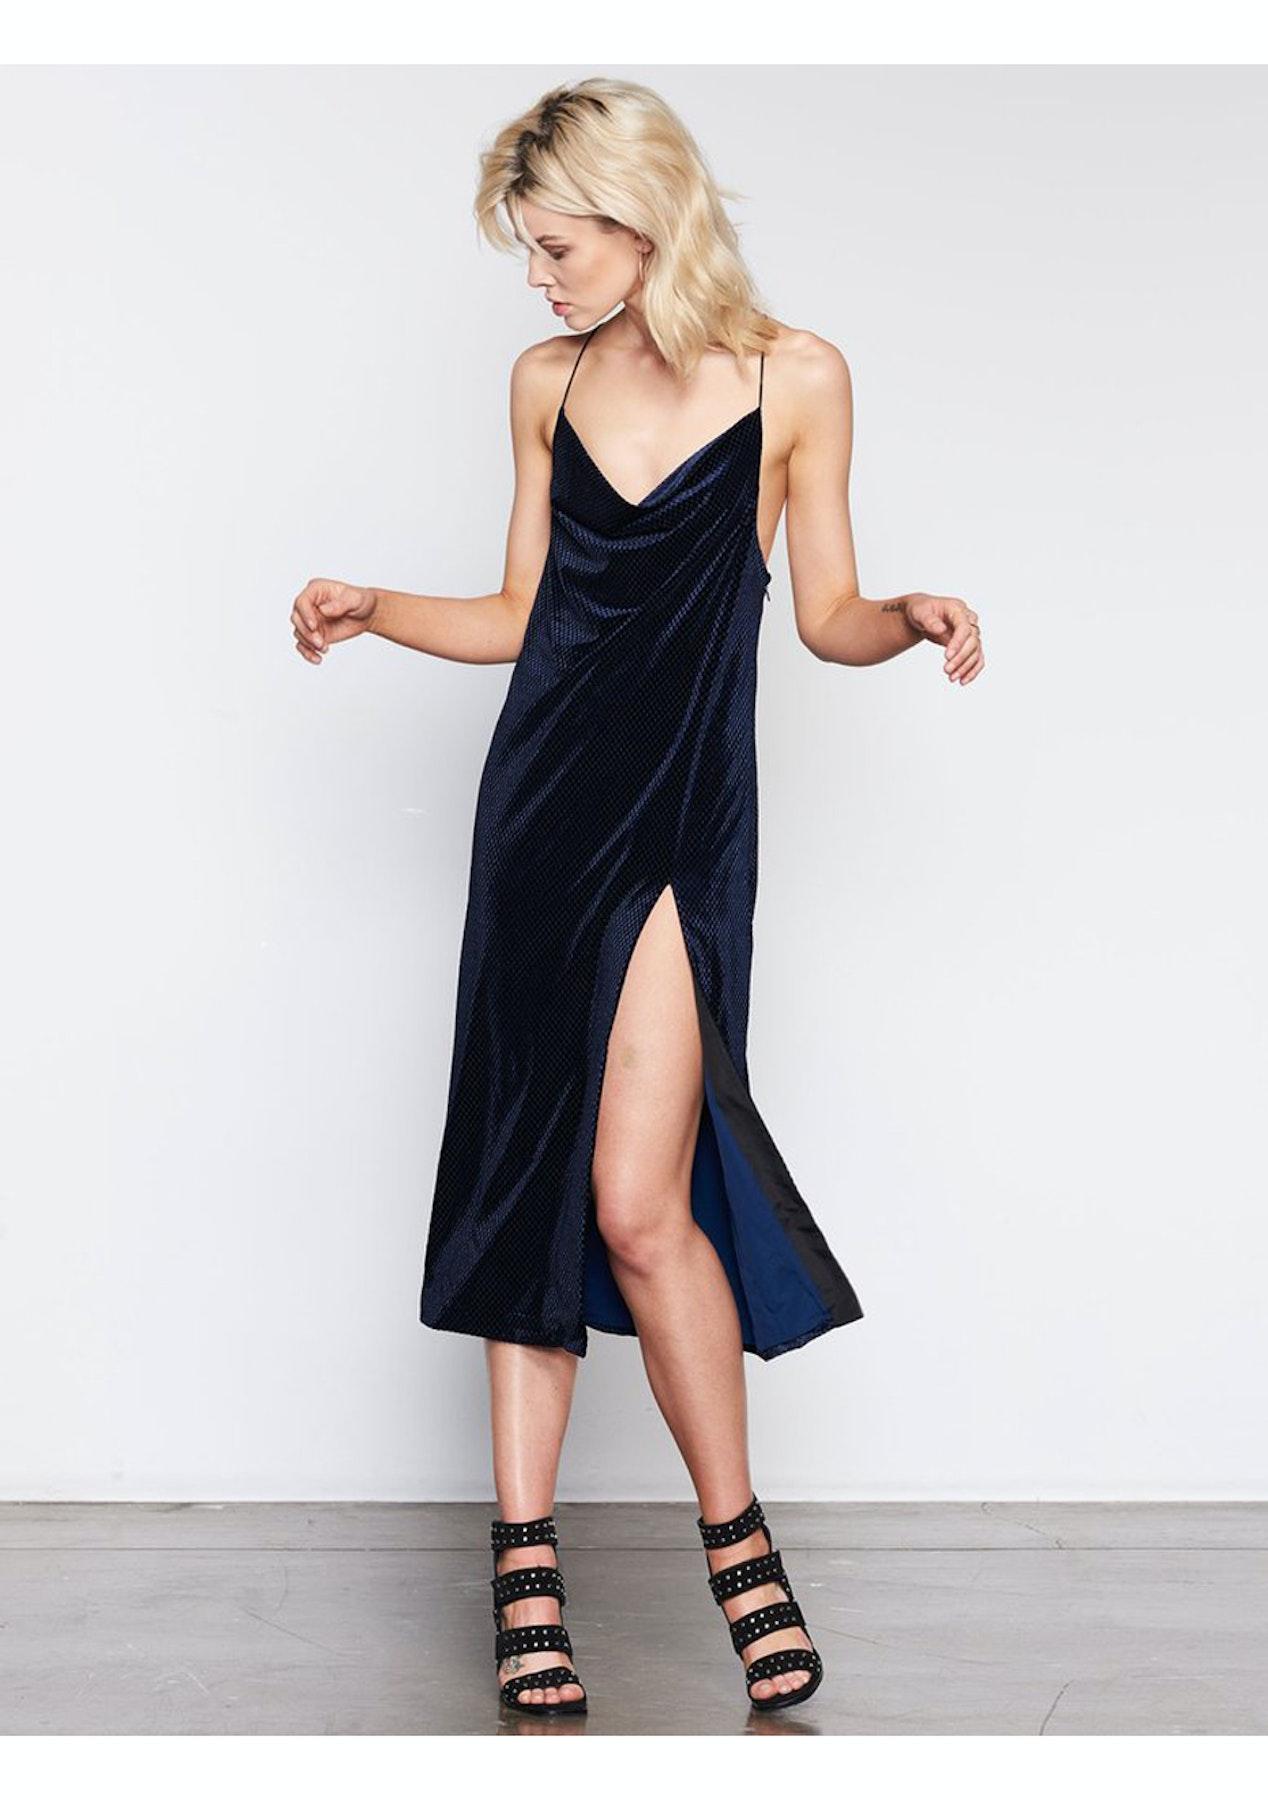 3e3c7be729 ISLA - Celestial Dress - Blue Velvet - Free Shipping Shona Joy & Isla -  Onceit